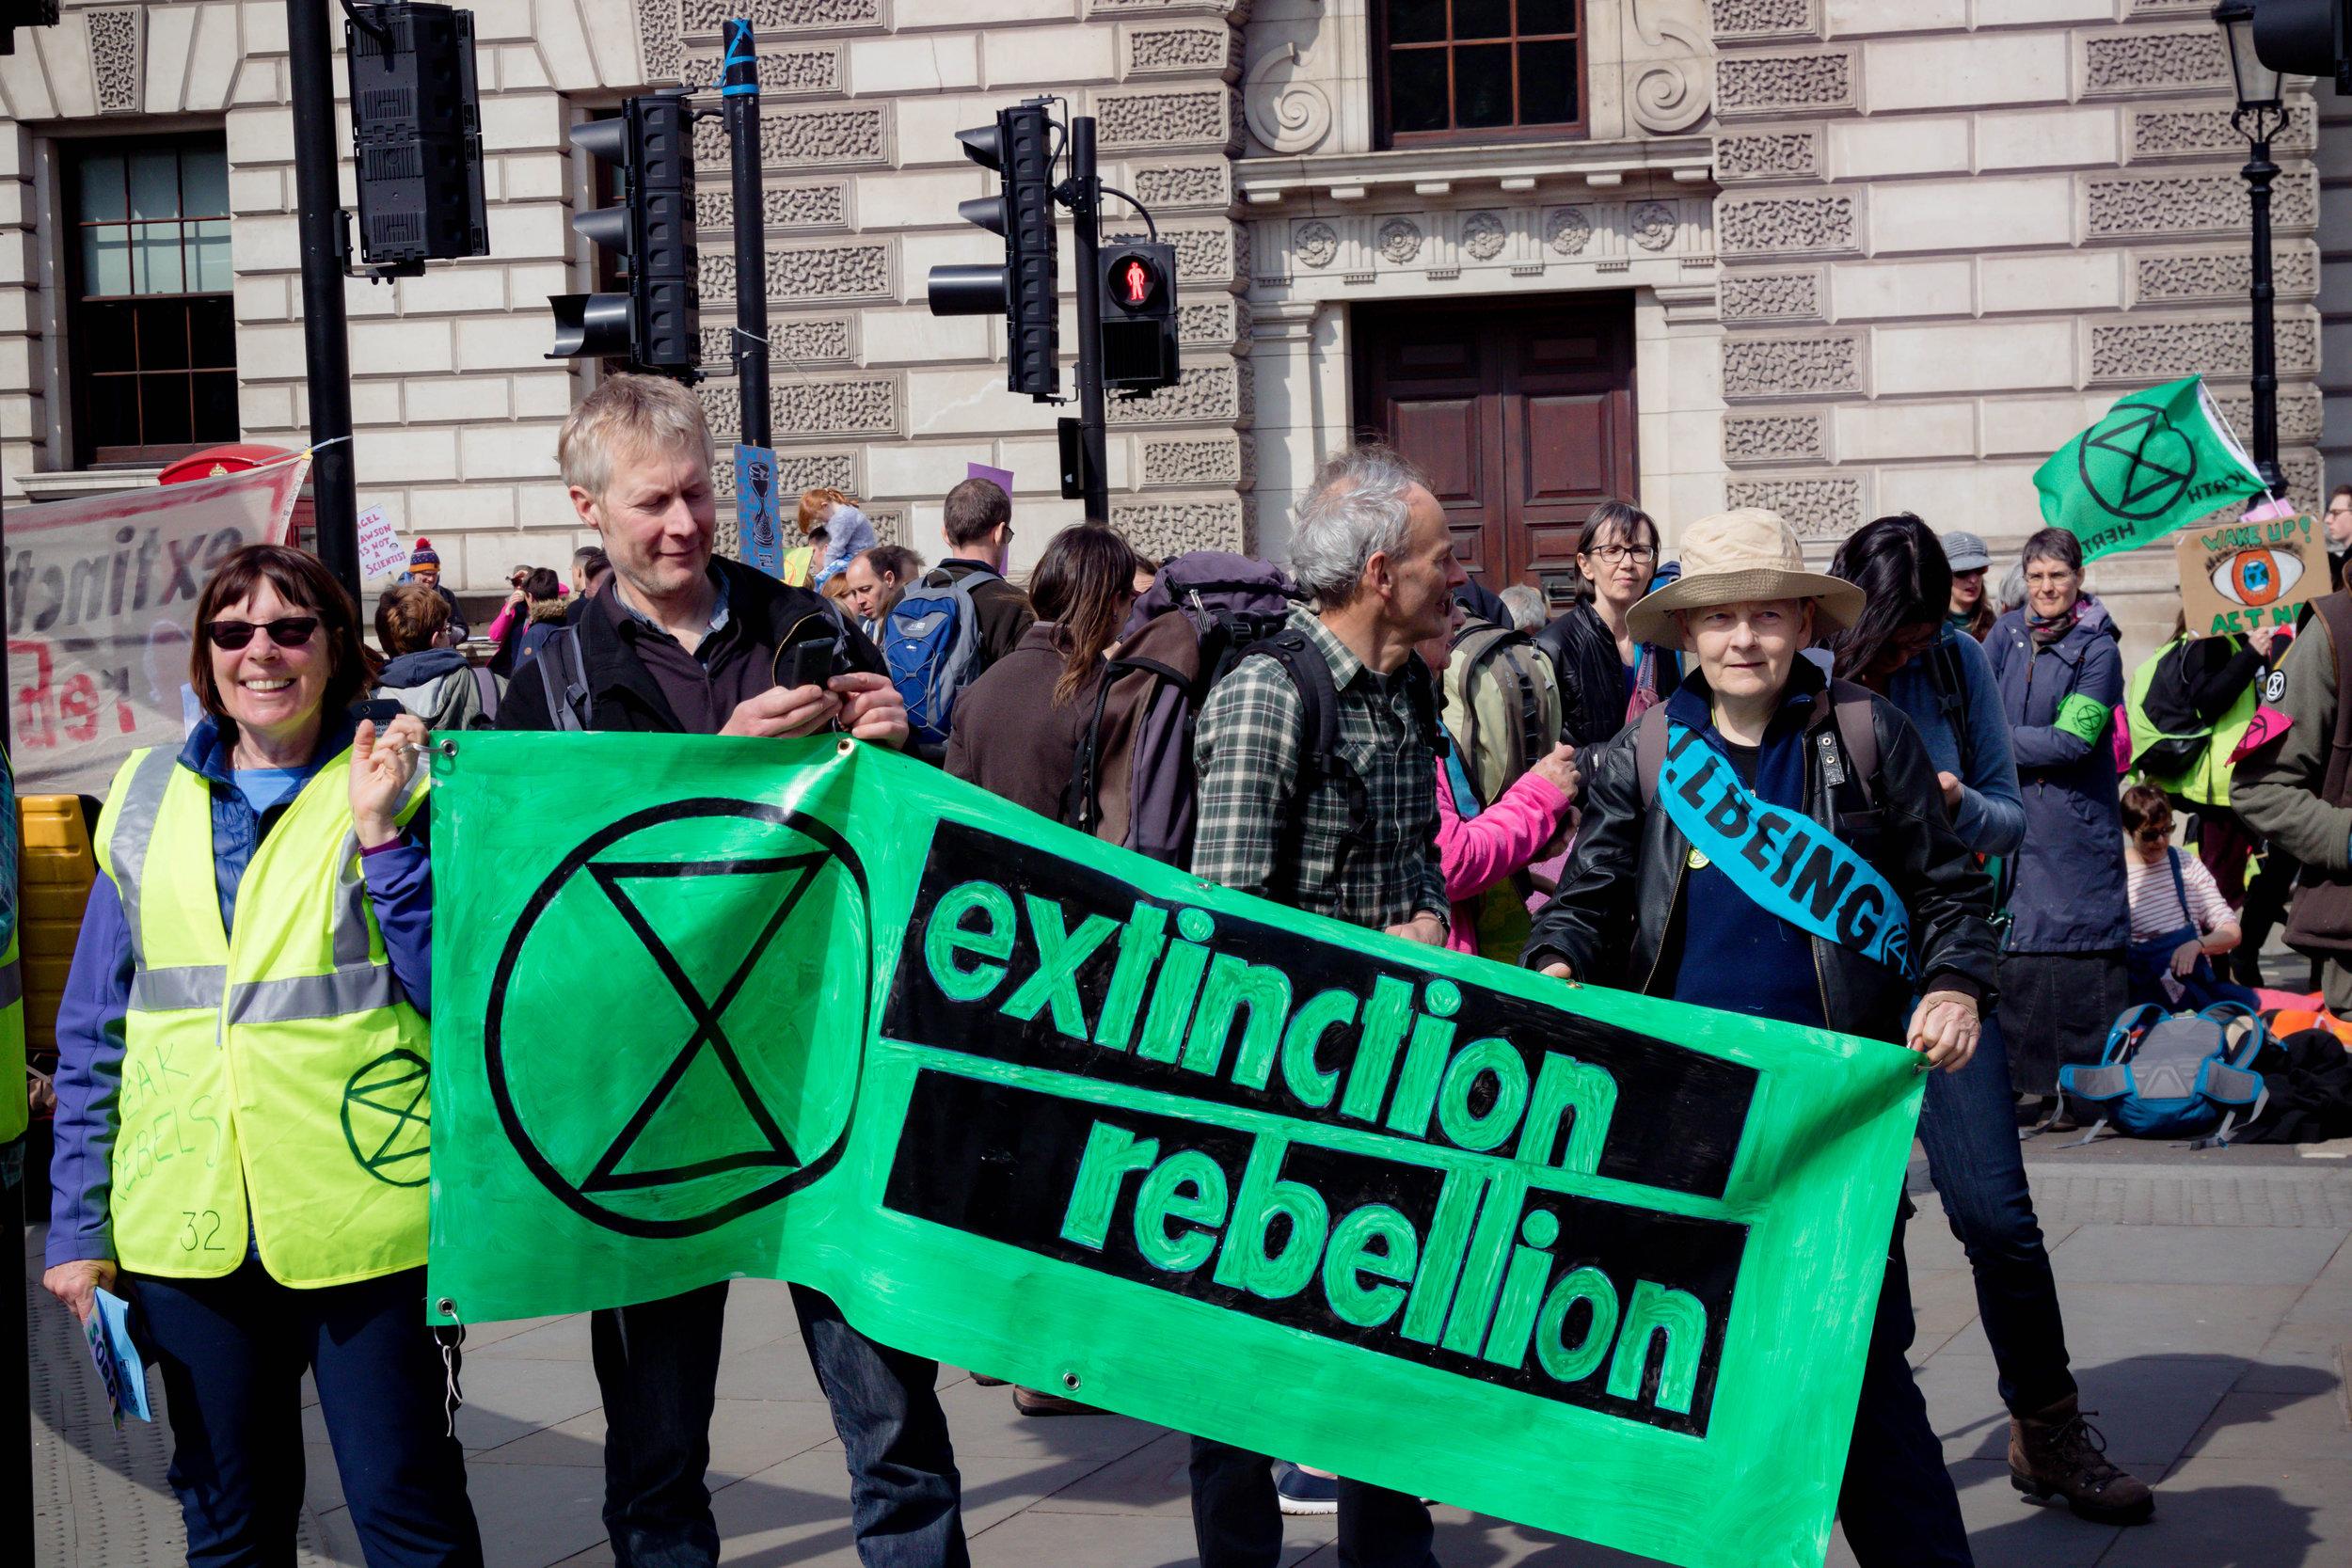 Demonstrators outside UK Parliament, April 15, 2019. Credit: Shutterstock.com